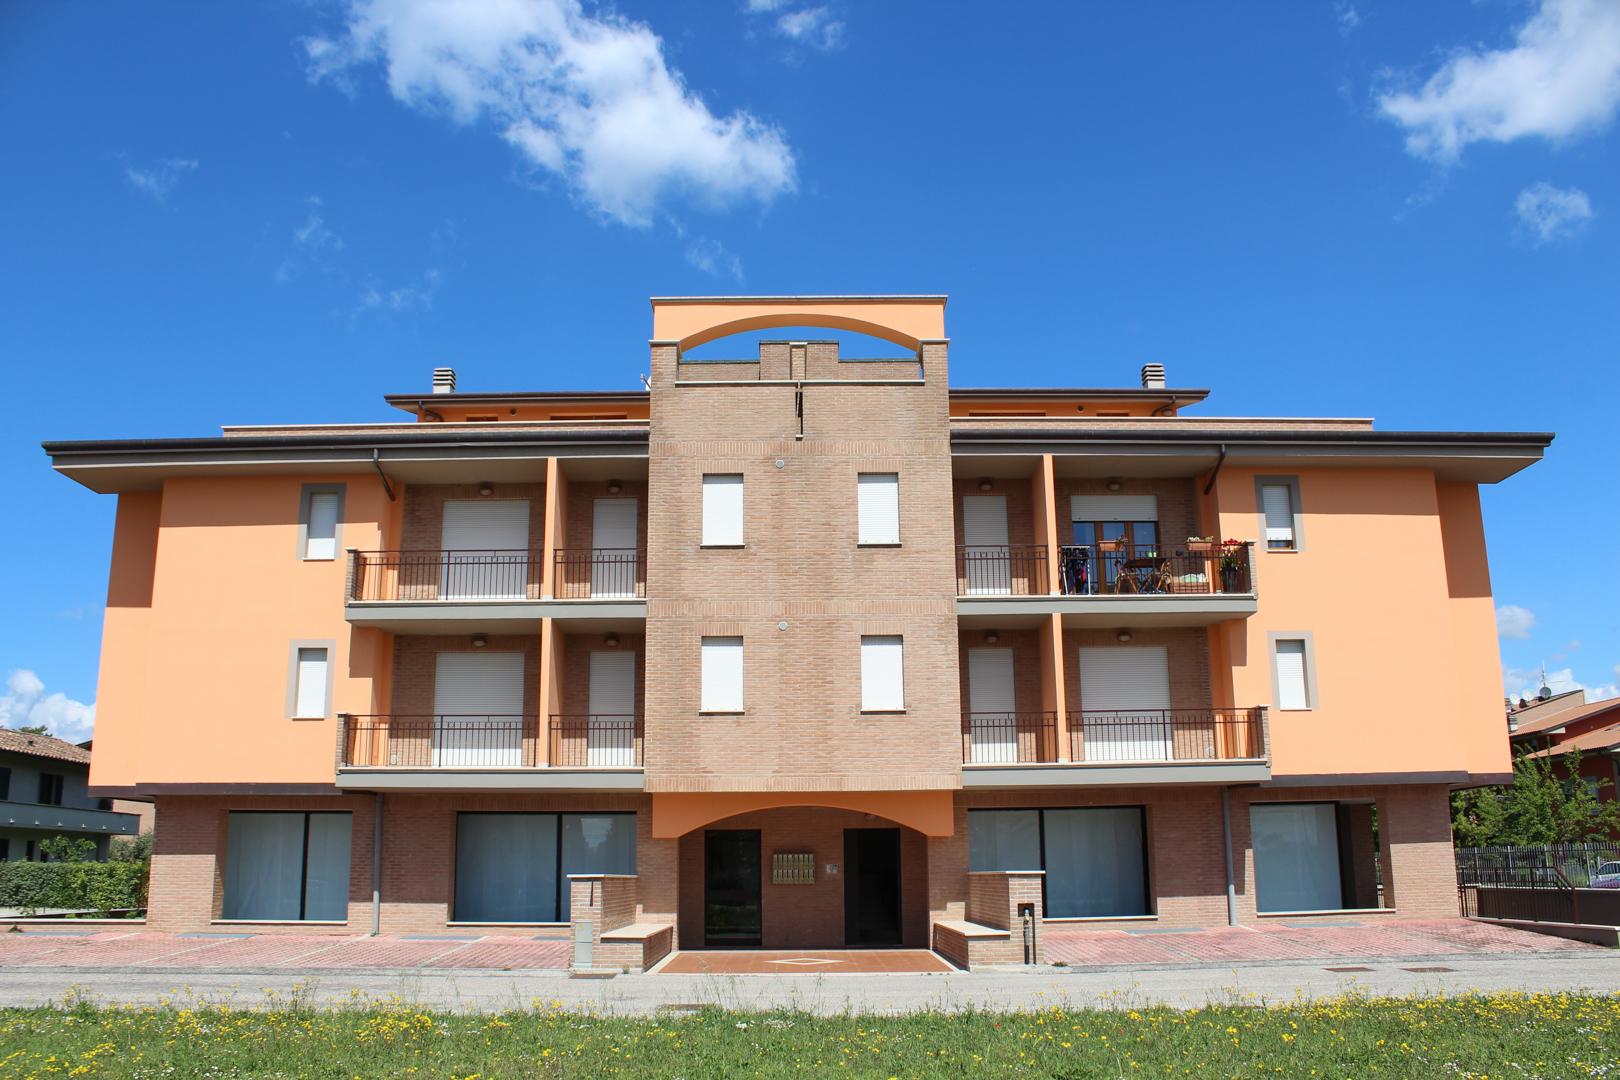 Cbi067 26315 appartamento in vendita a bastia umbra - Casa it valutazione immobili ...